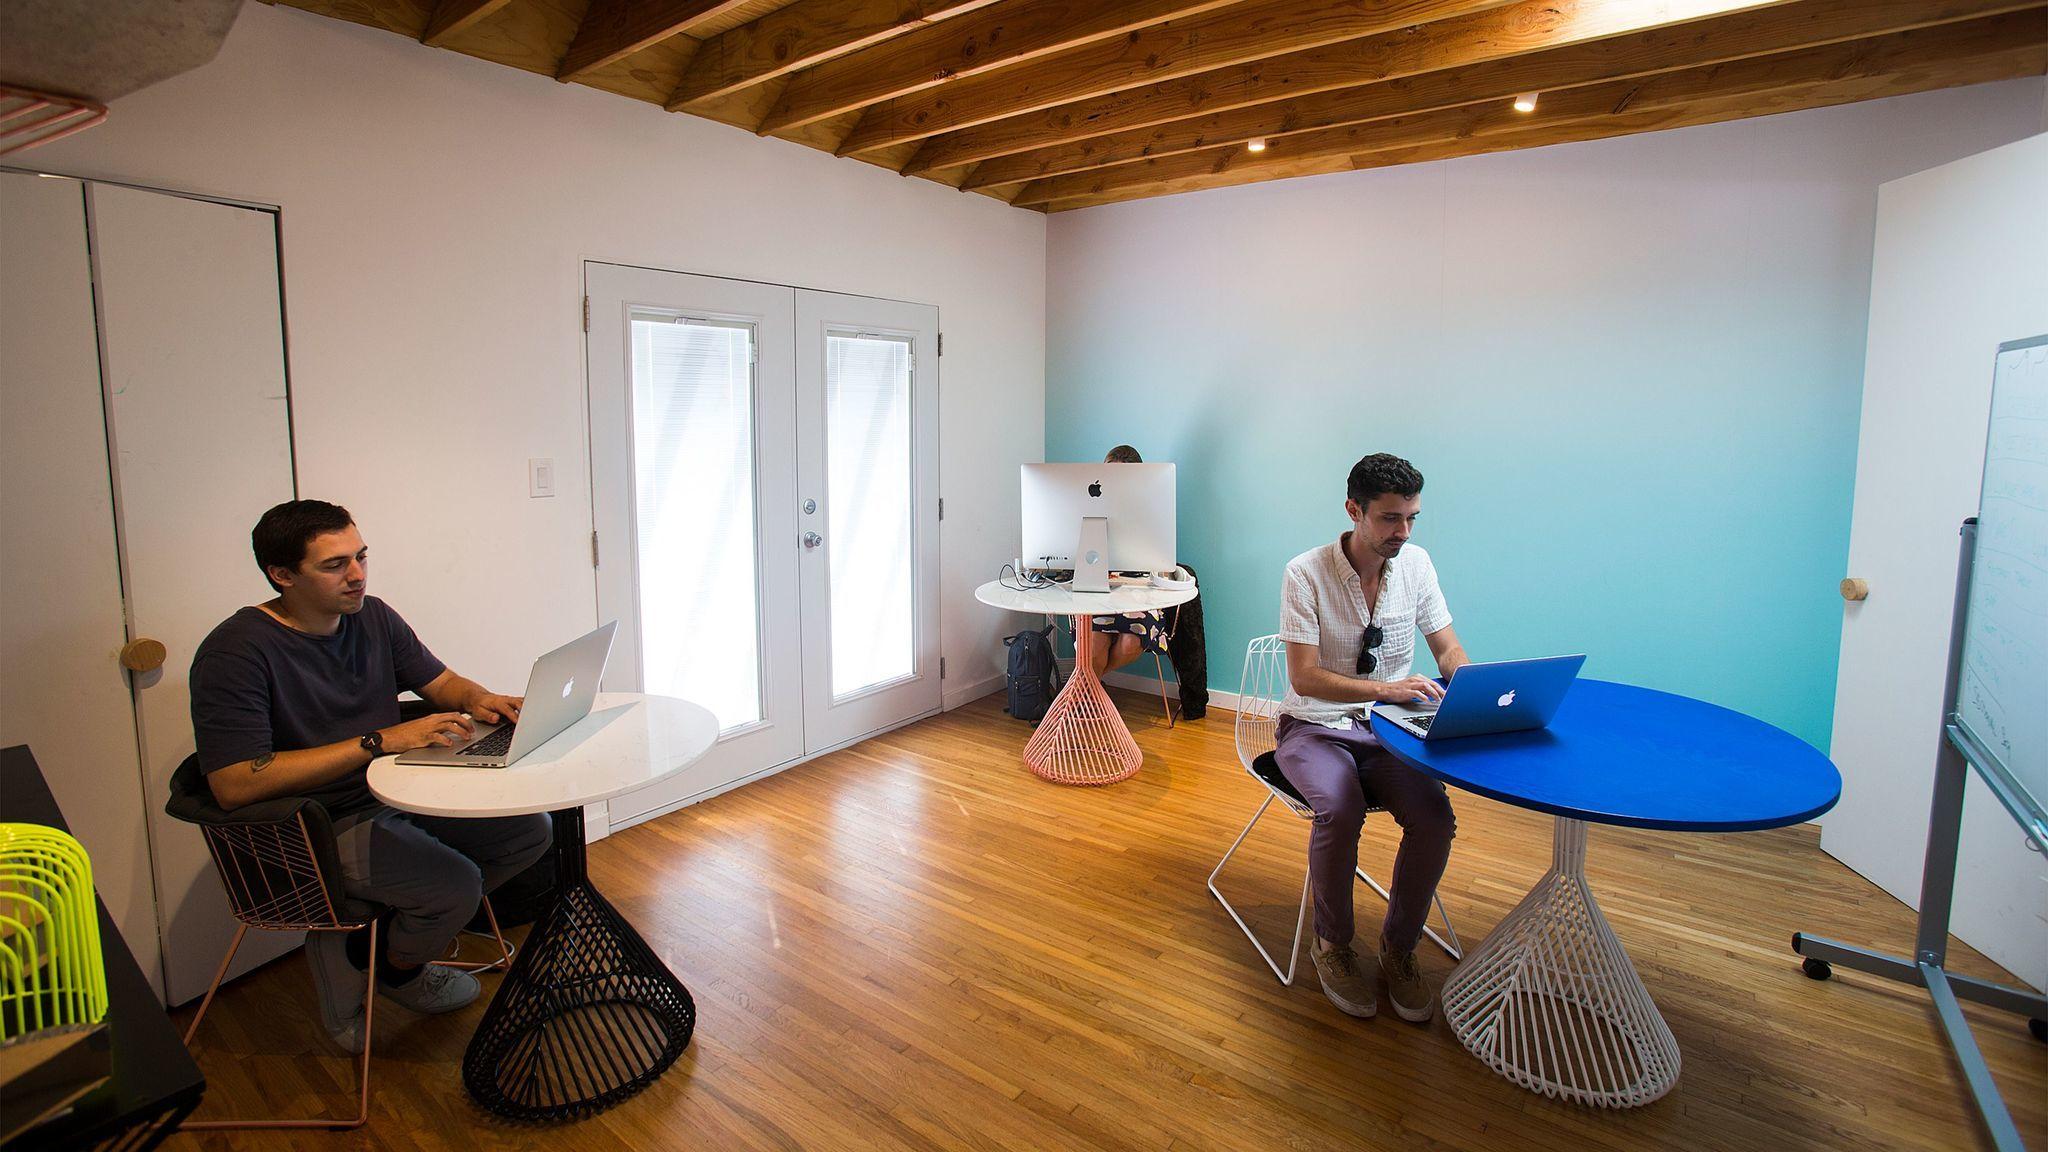 Employees work in an open work space in the home and studio of Bend Goods designer Gaurav Nanda.